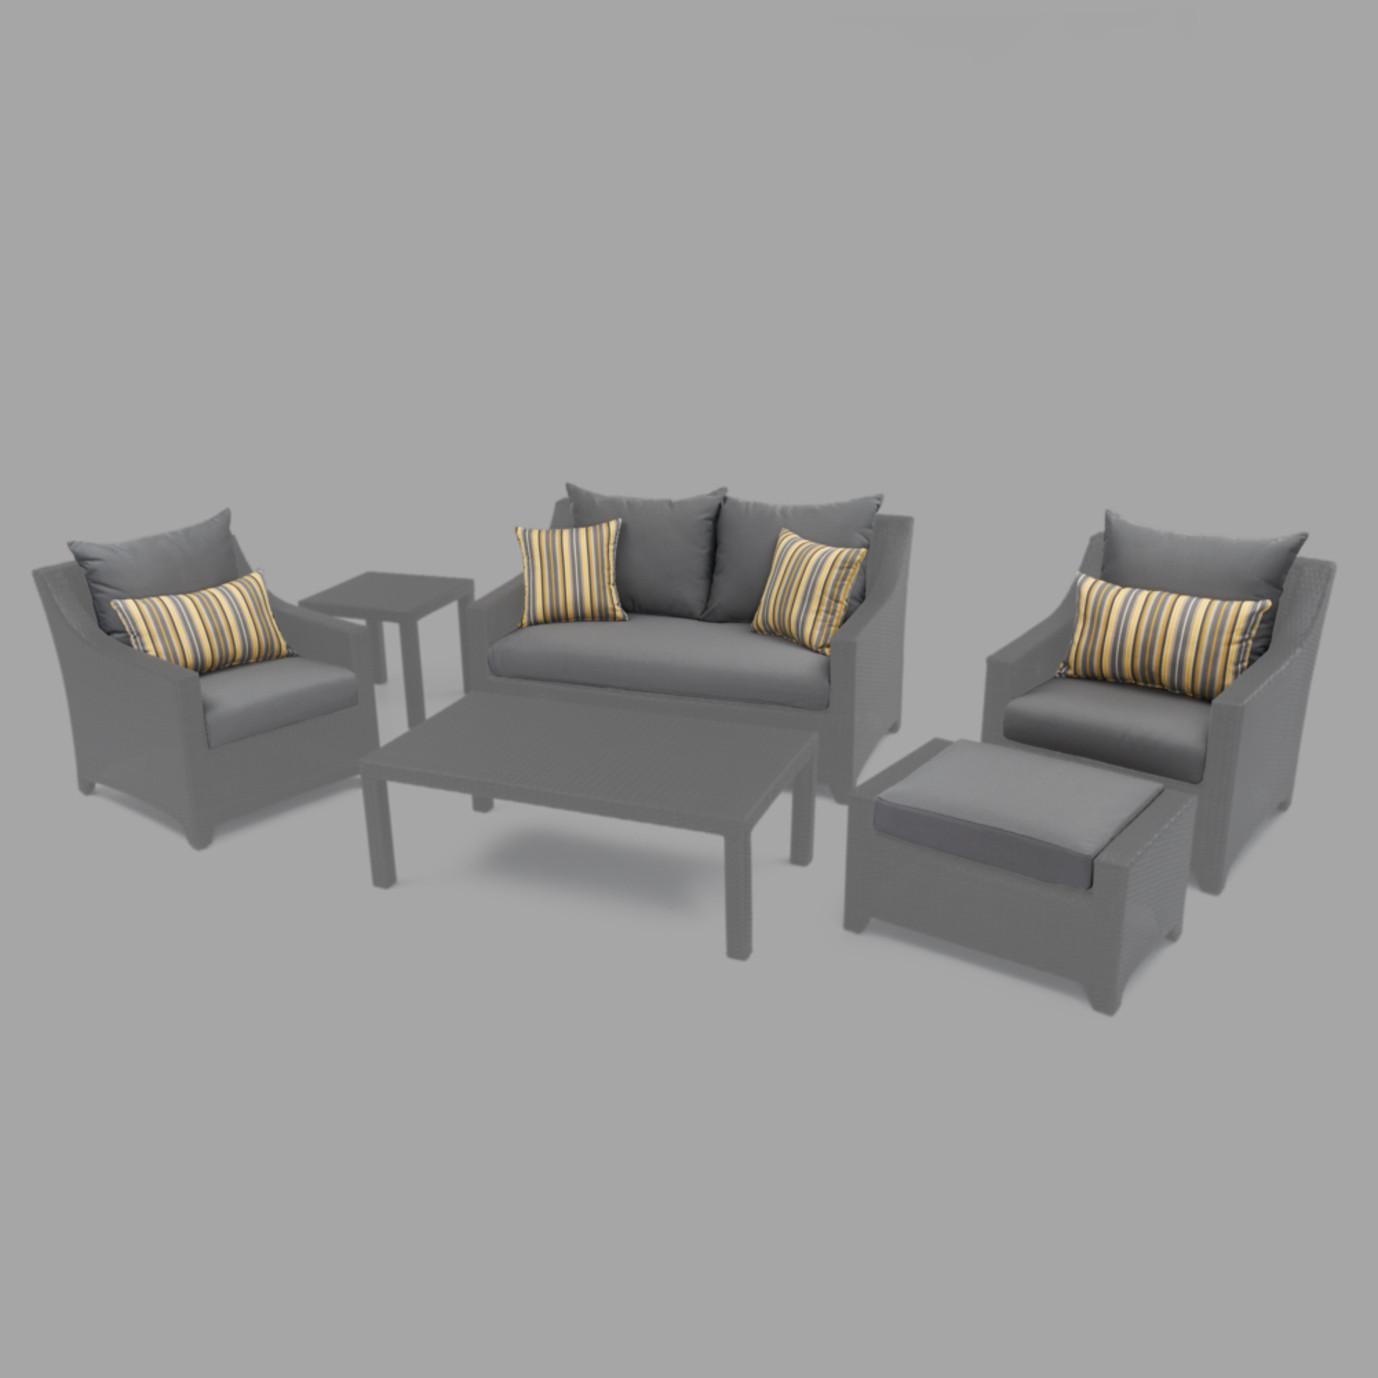 Modular Outdoor 6pc Love Cushion Cover Set - Charcoal Grey